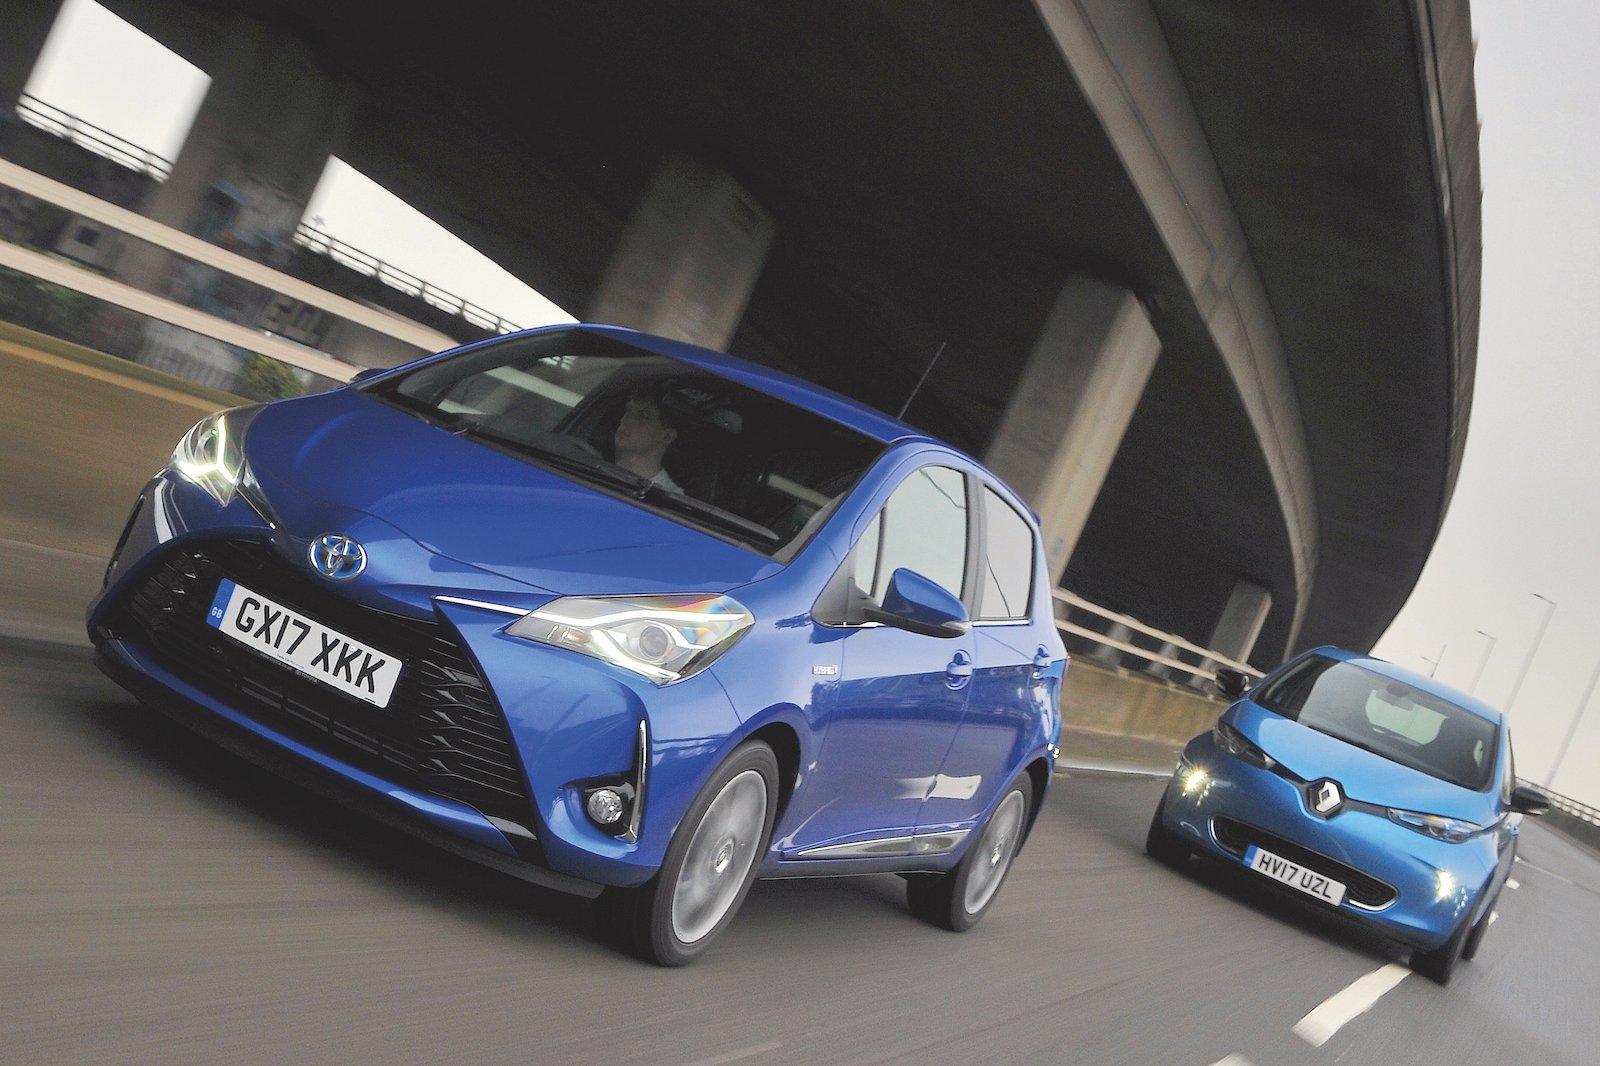 Used test: Renault Zoe vs Toyota Yaris Hybrid